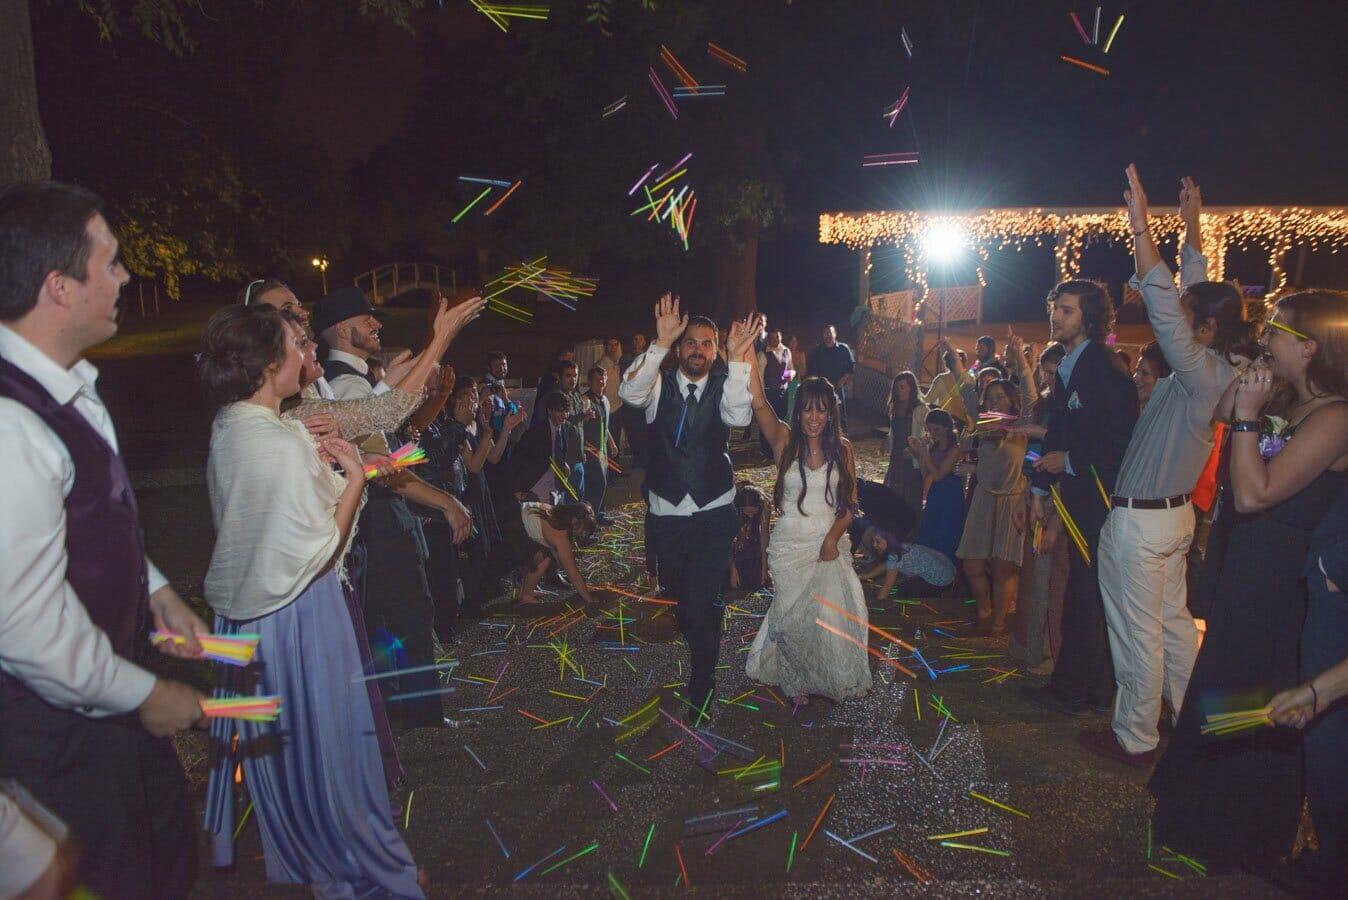 Wedding Exit using glowsticks